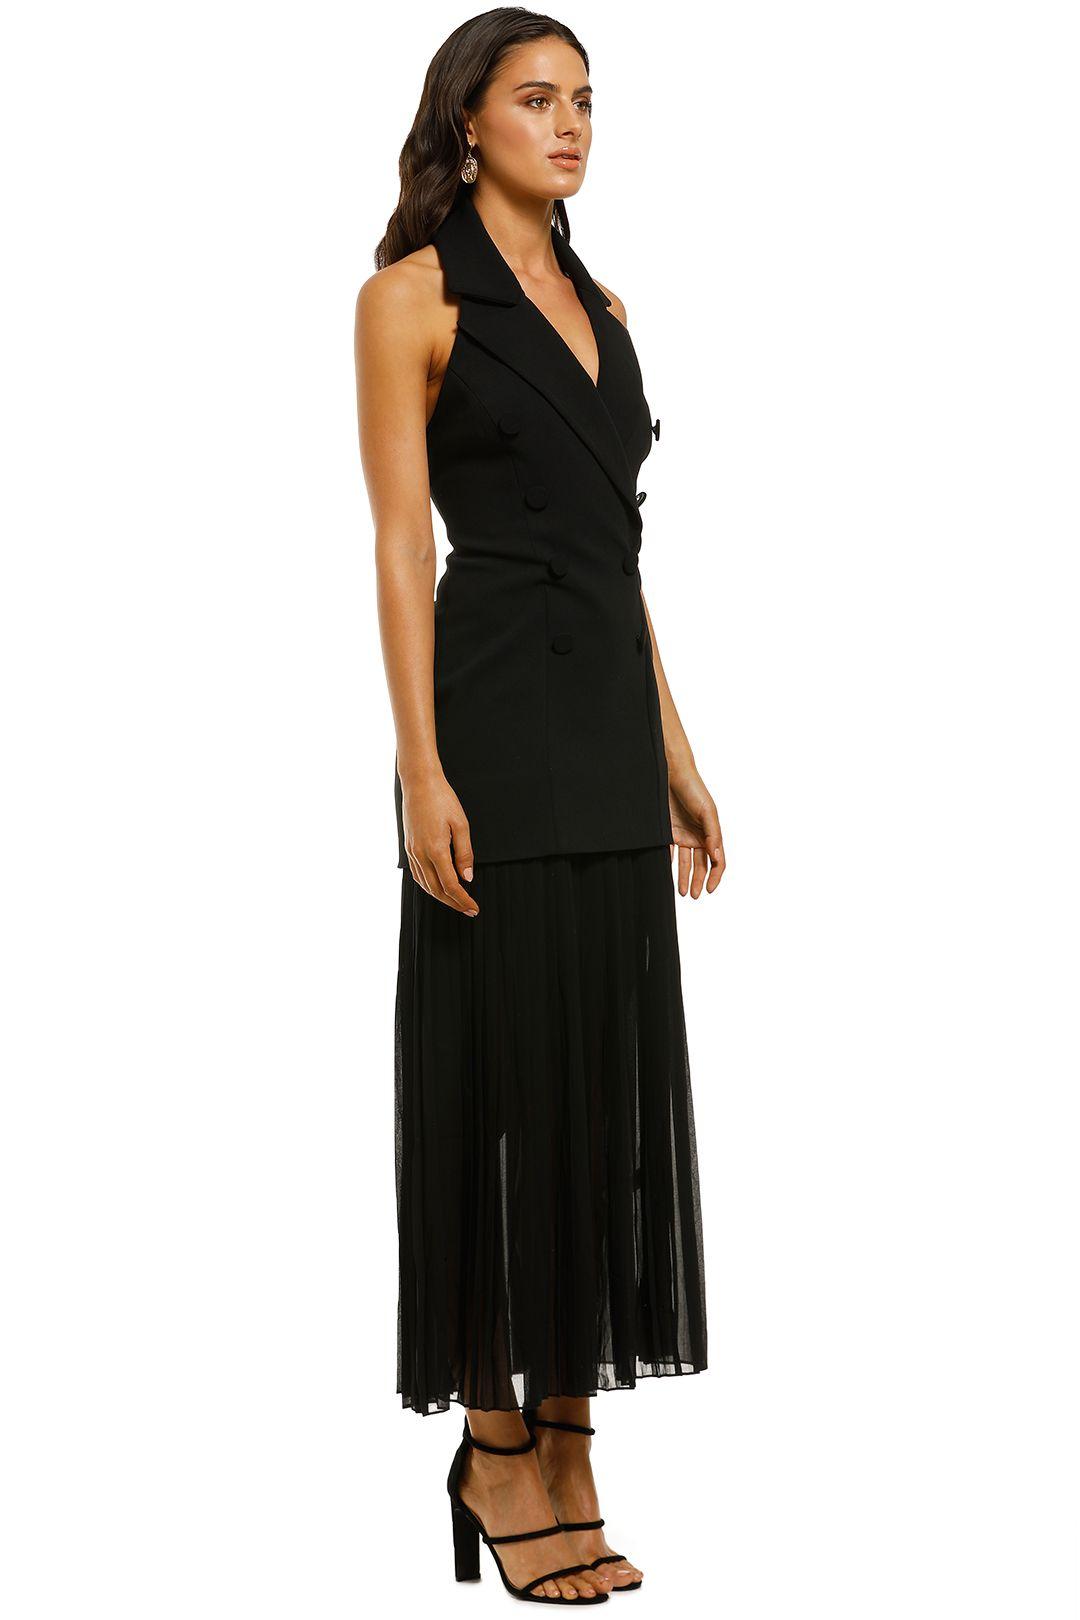 Misha-Collection-Sammiah-Dress-Black-Side